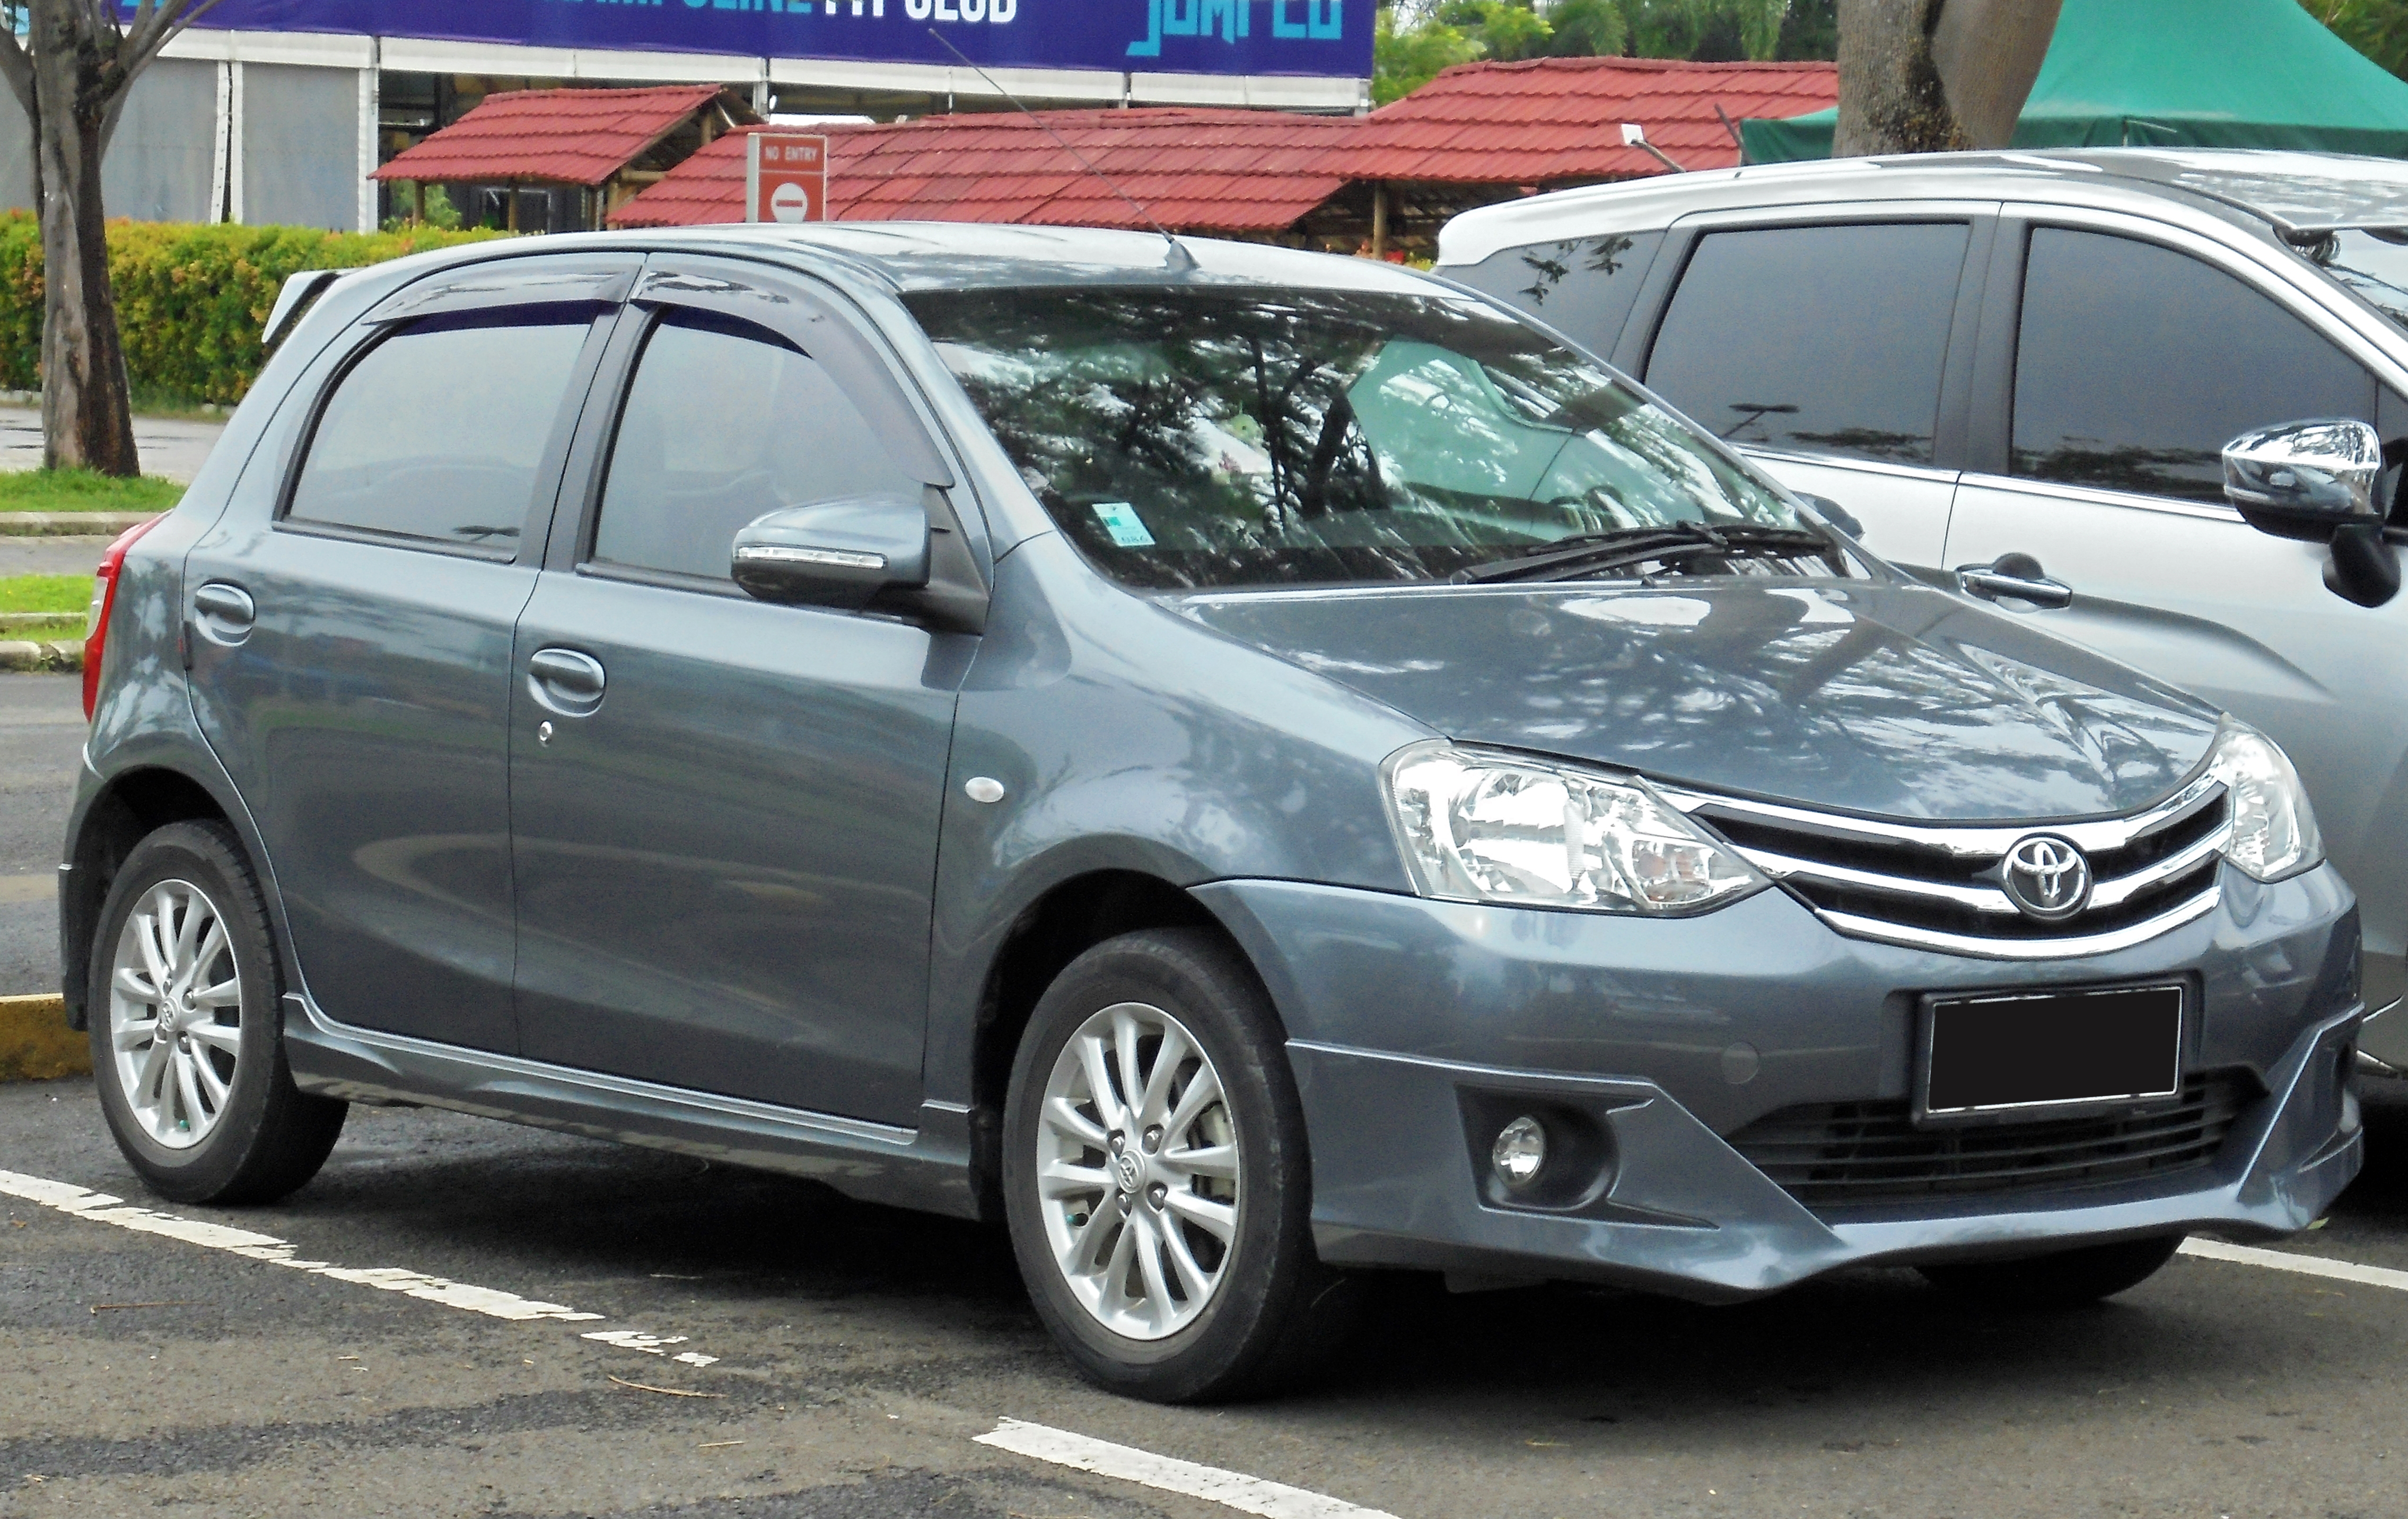 File:2014 Toyota Etios Valco 1.2 G Hatchback (NGK10R; 01